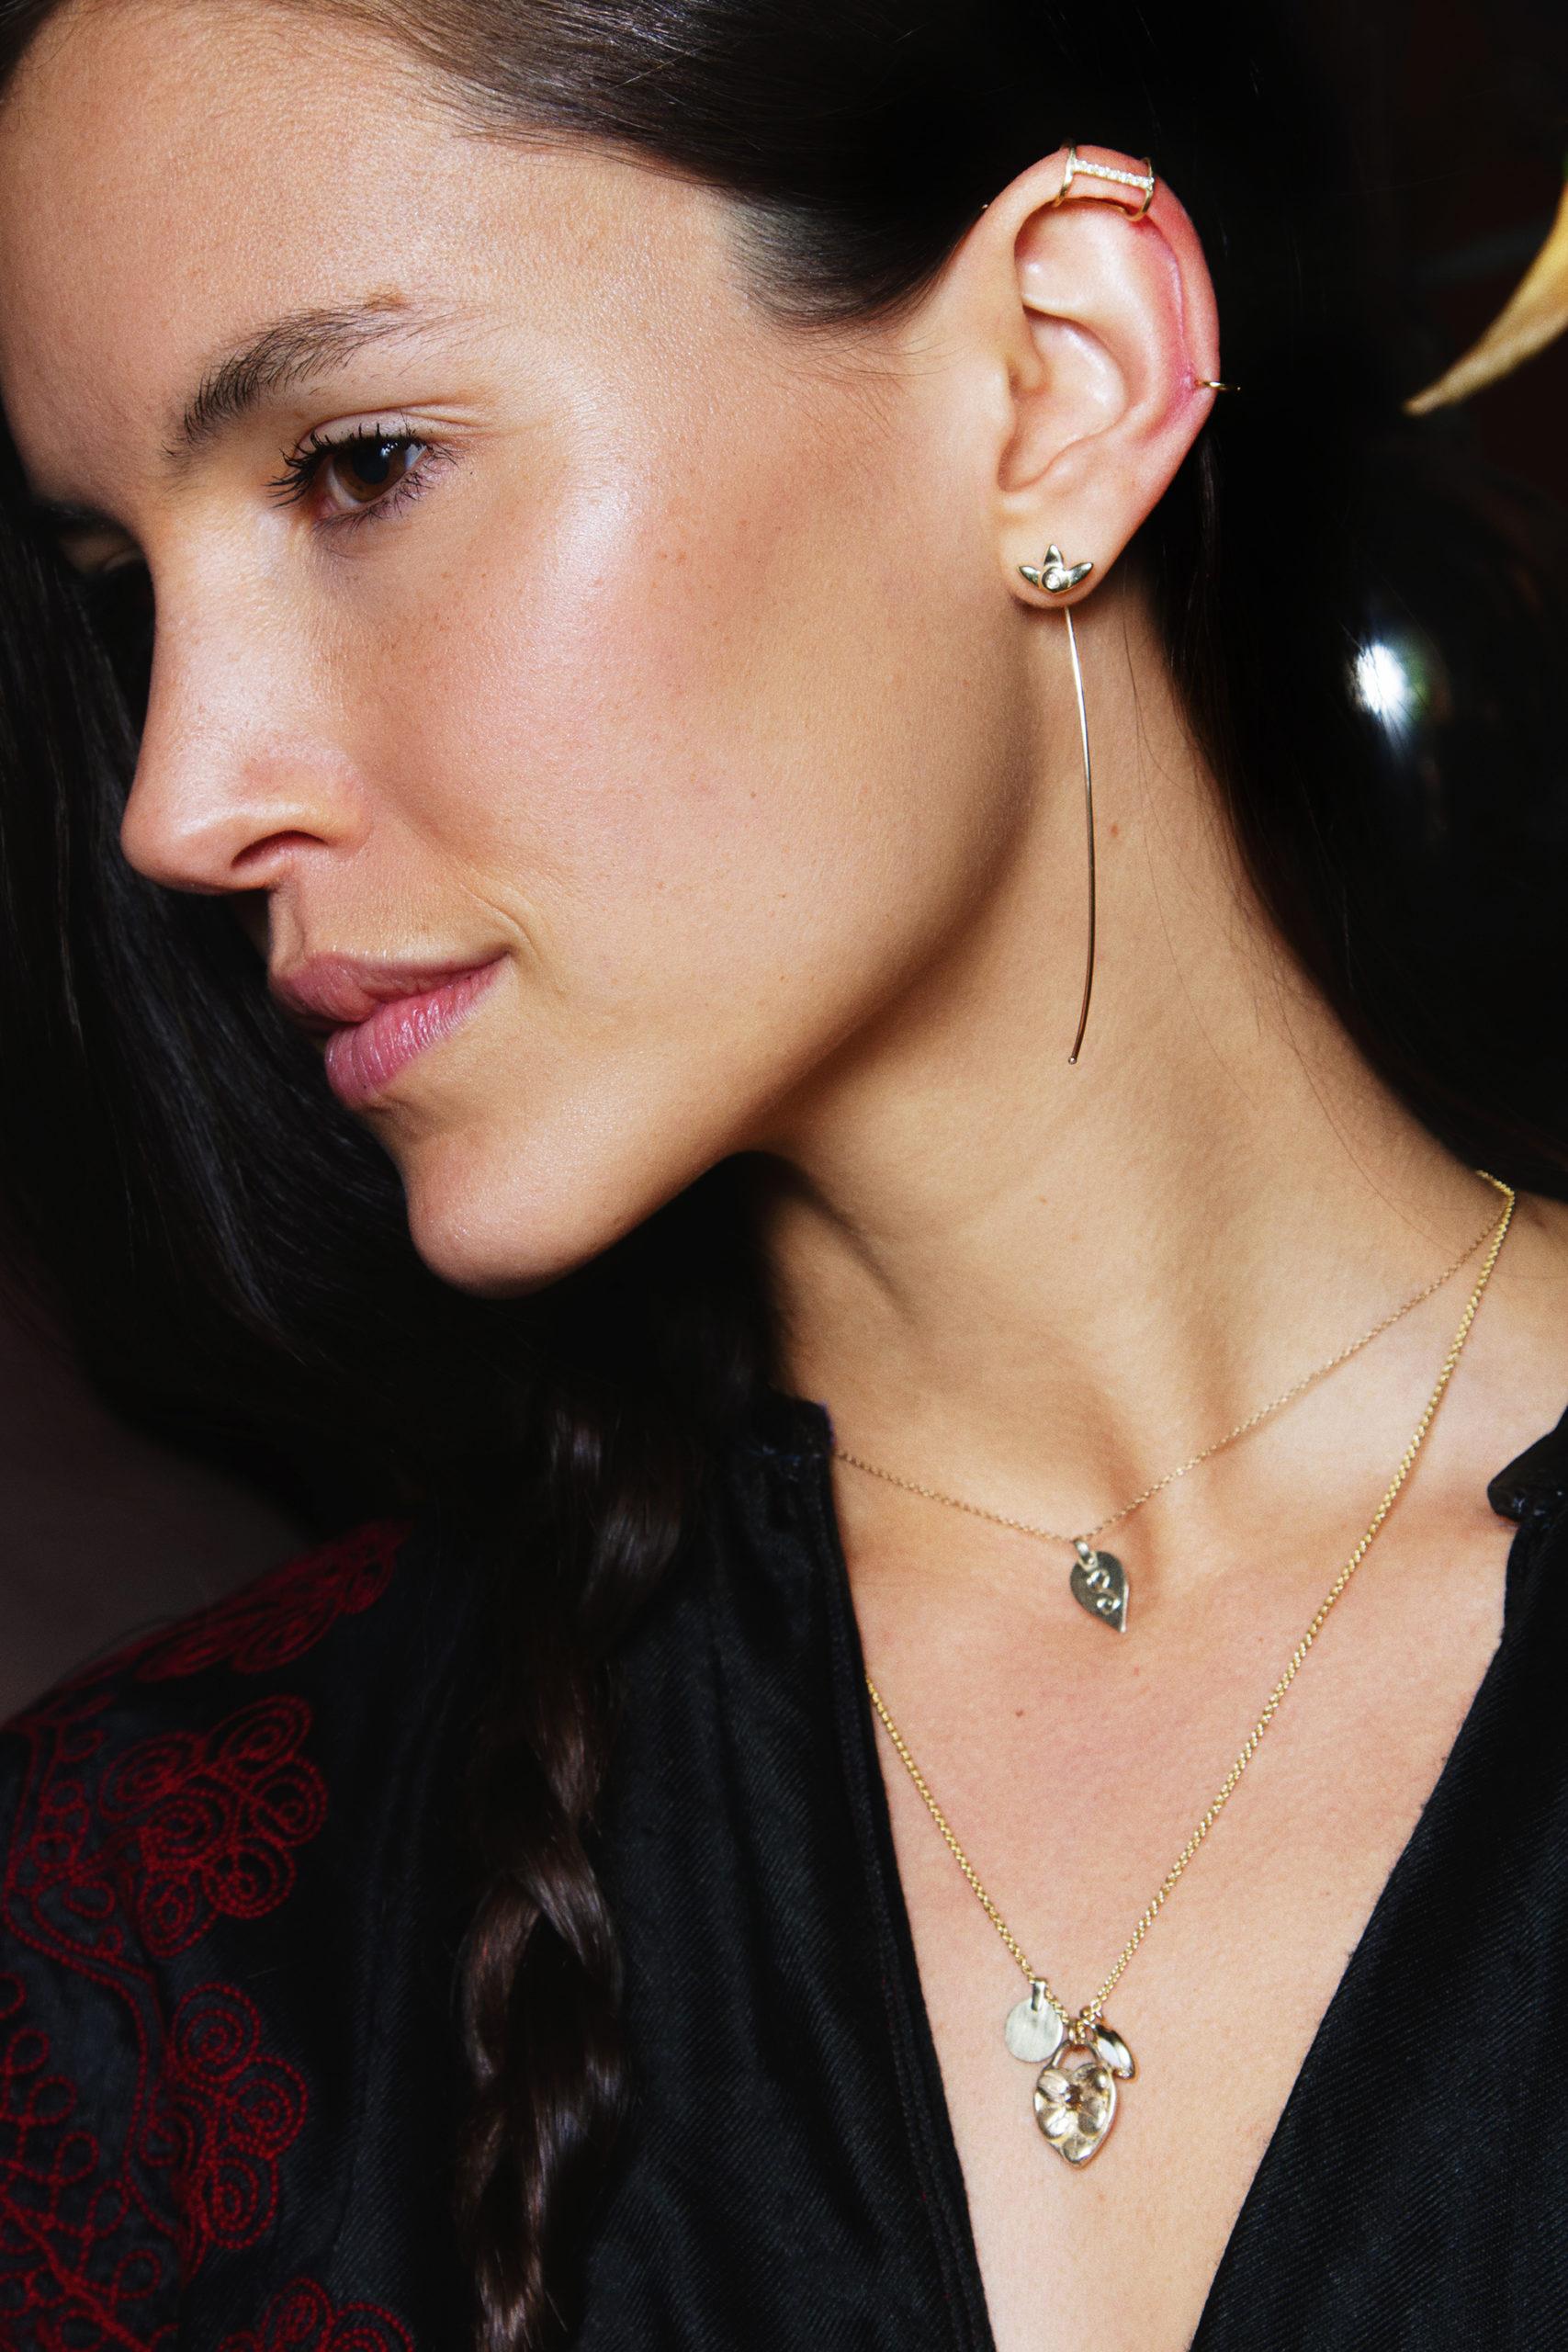 SScosha jewelry collection